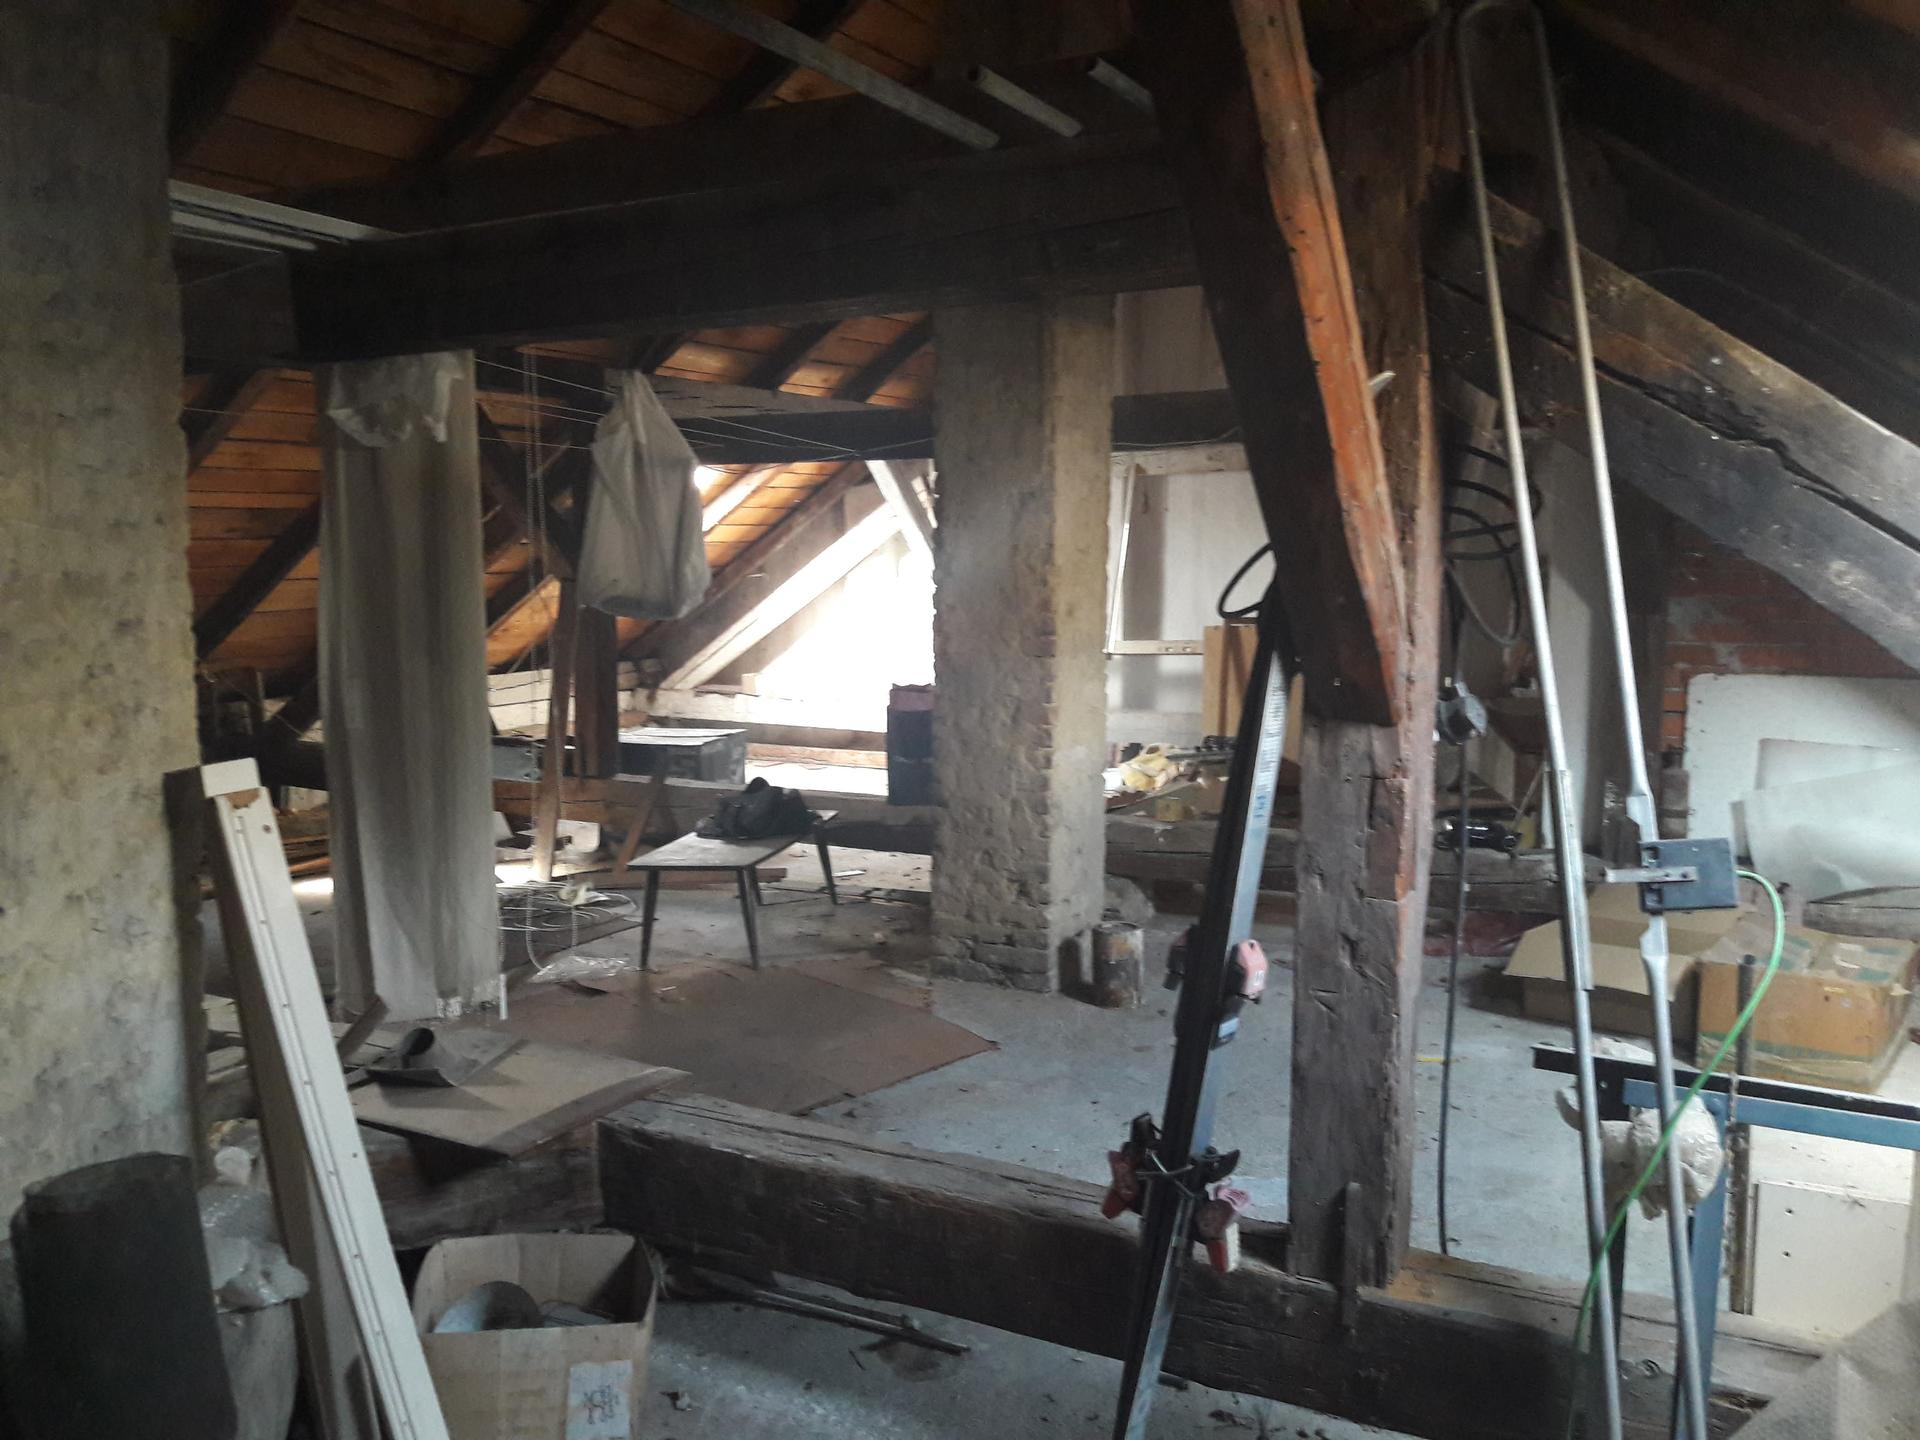 Prestavba podkrovia zo sedlovo valbovej na sedlovú strechu. - Obrázok č. 4